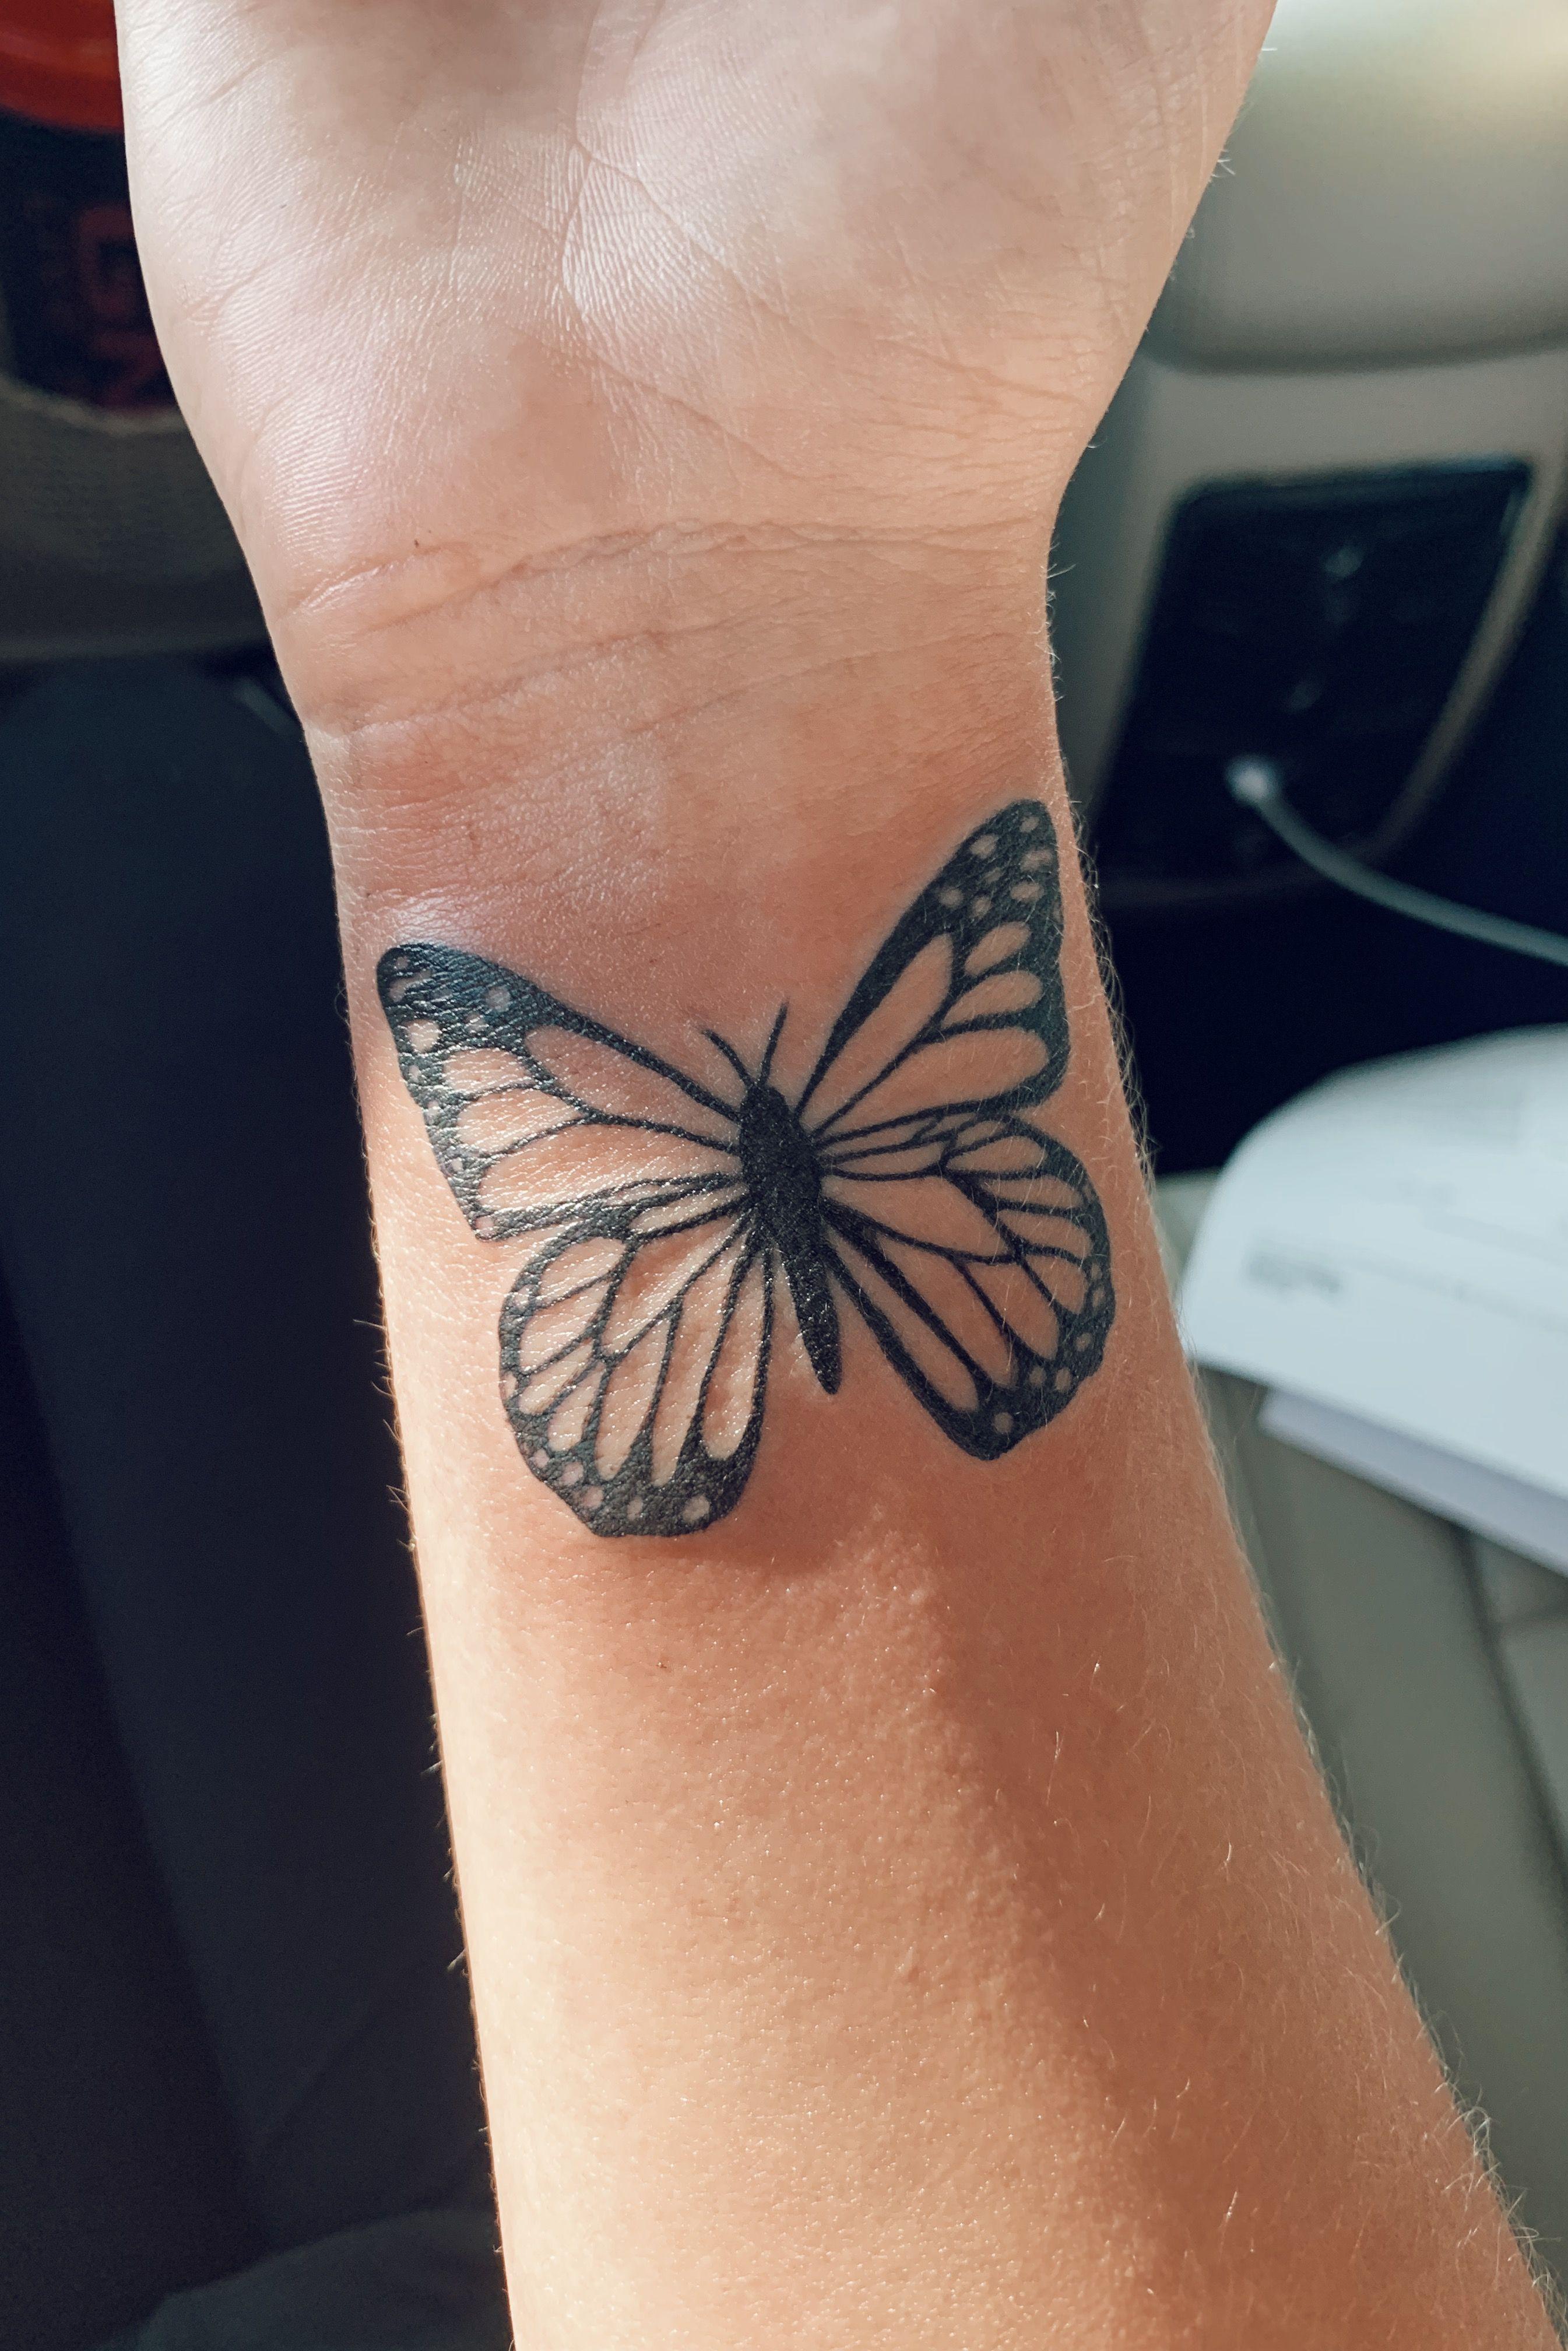 Butterfly Tattoo Butterfly Tattoo Small Tattoos Tattoos